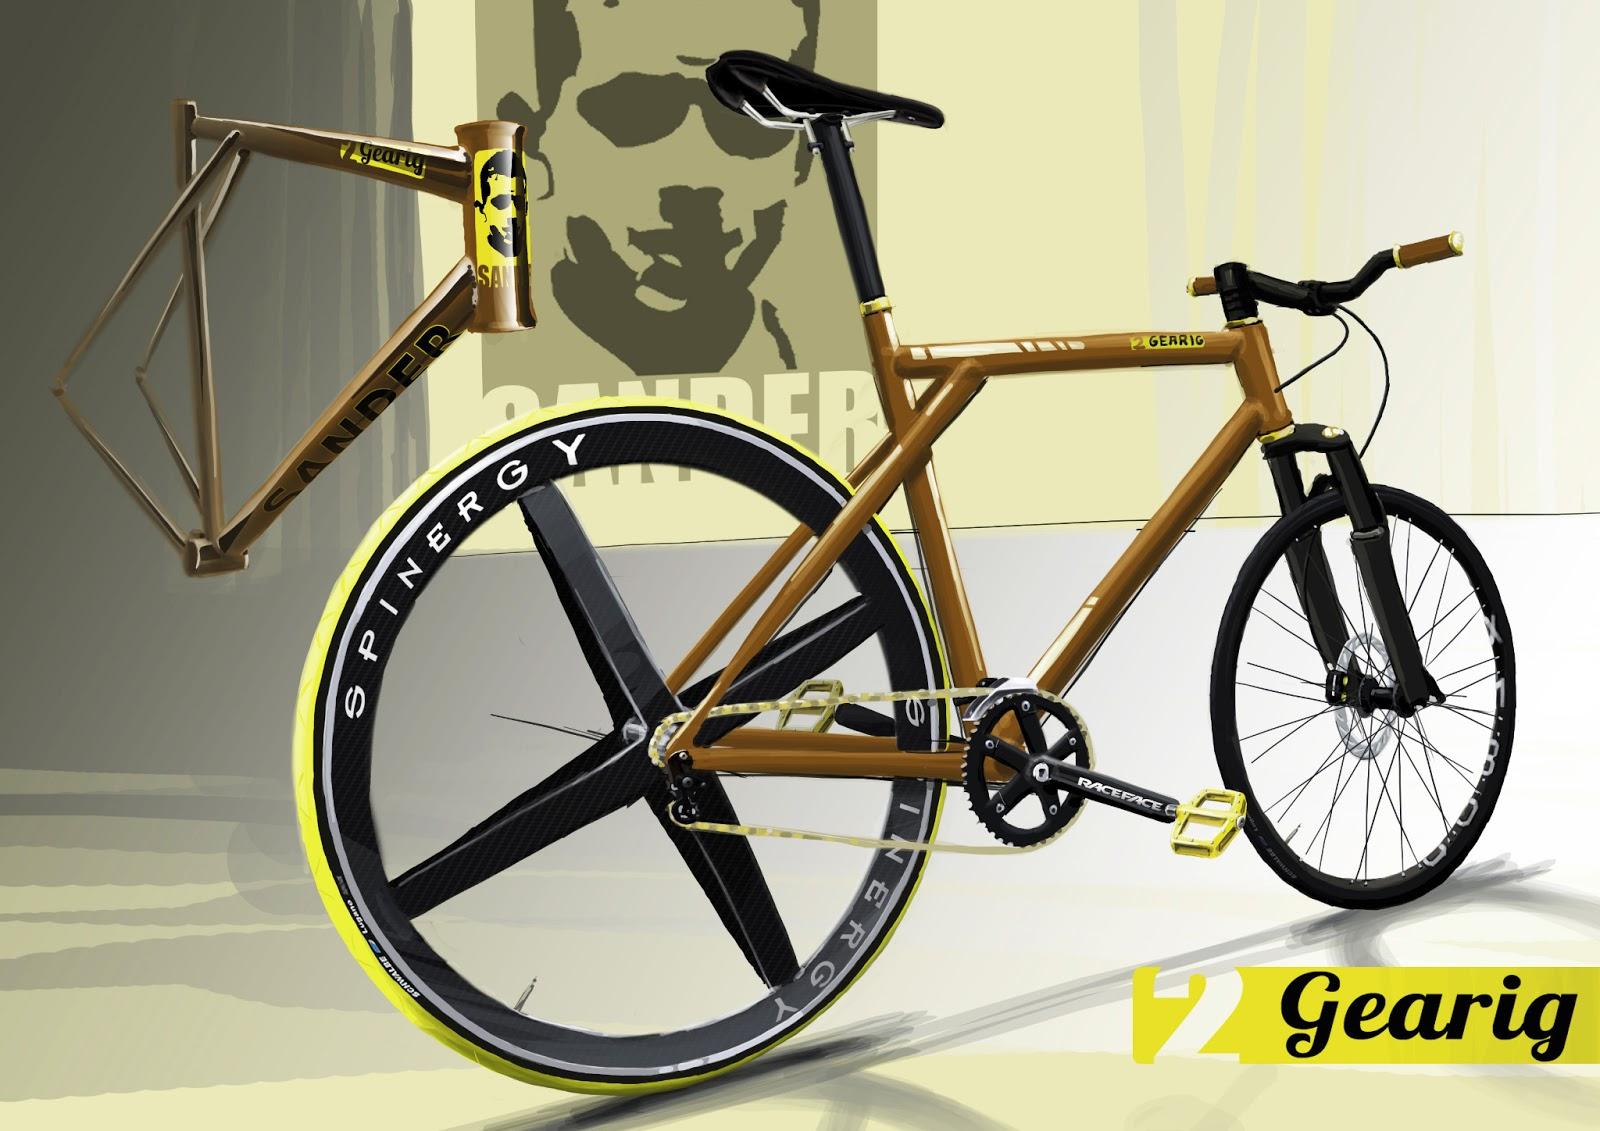 Sander Design Speedbike 2 Gearig Sketch Entwurf Skizze